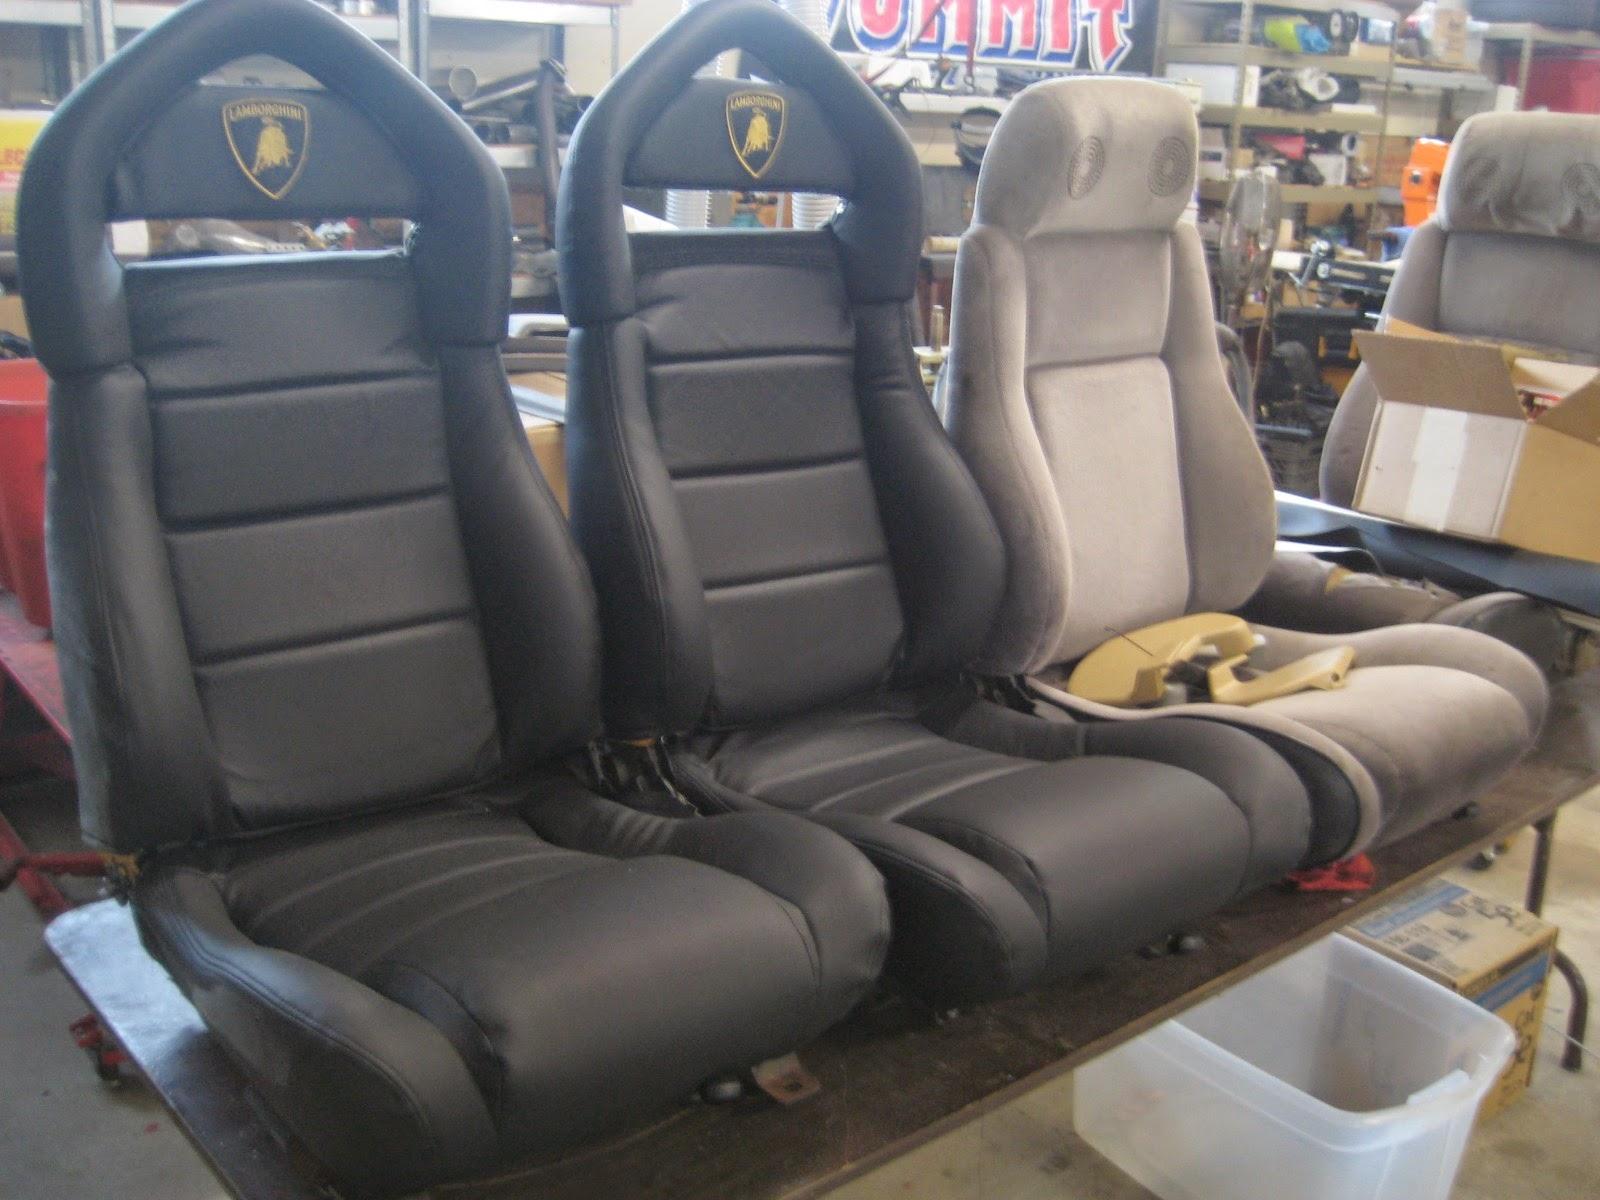 Donate Used Car Seats Custom Image